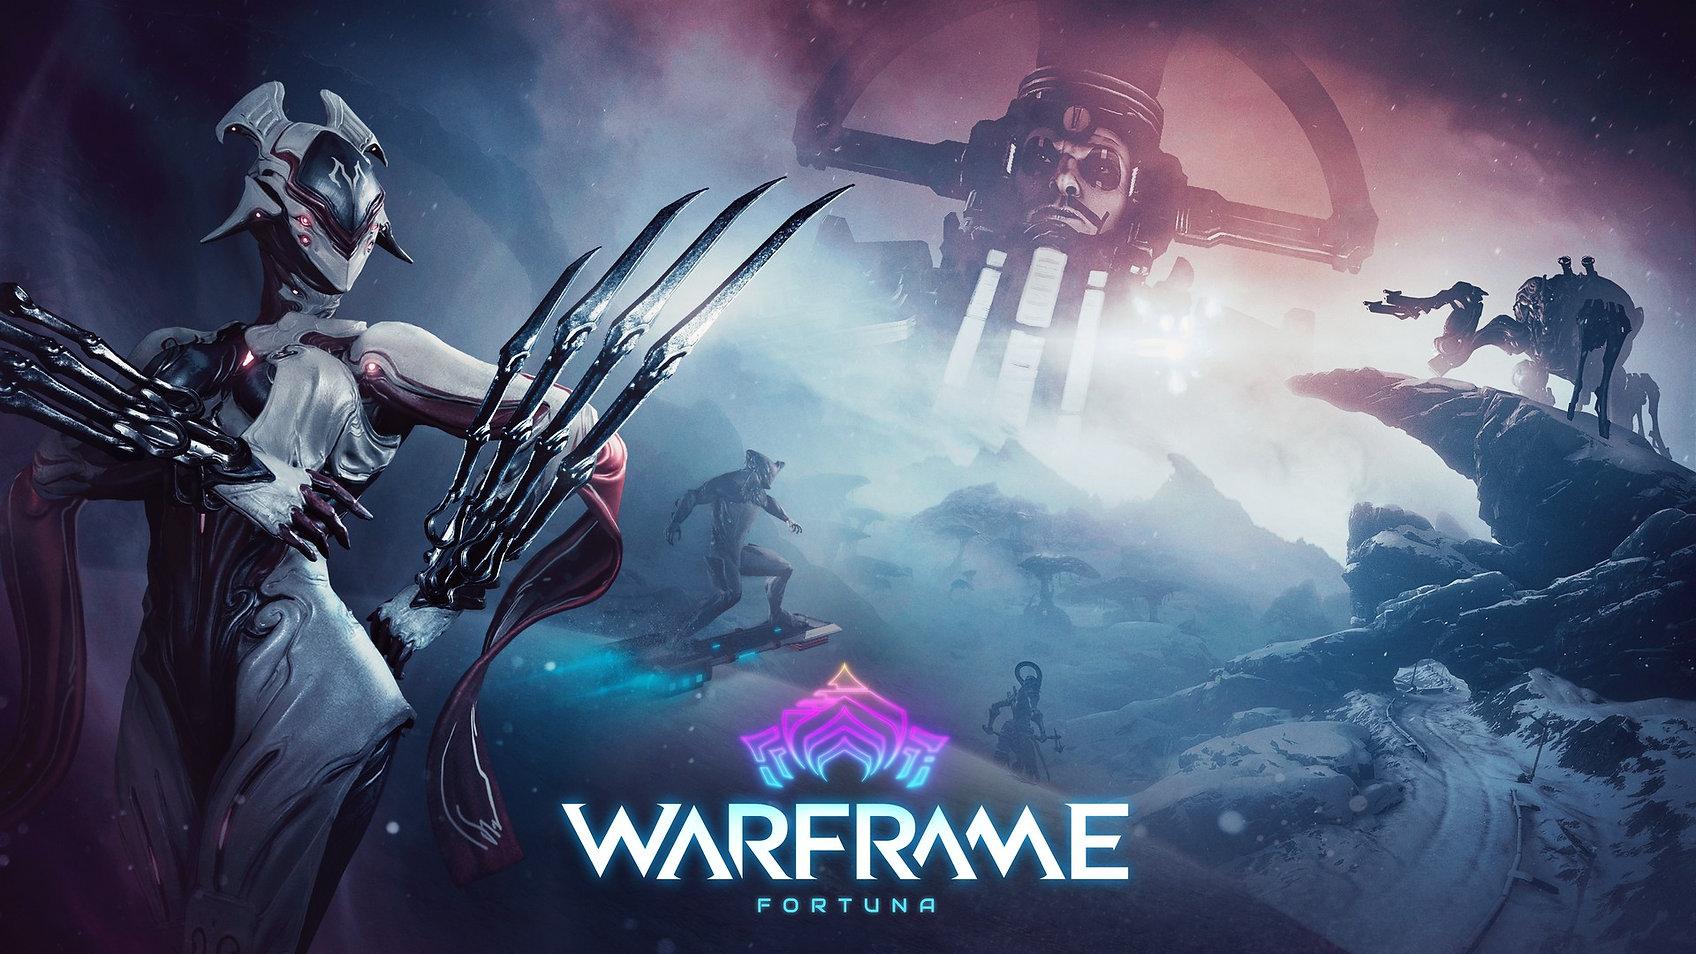 warframe-fortuna-promo-01.jpg